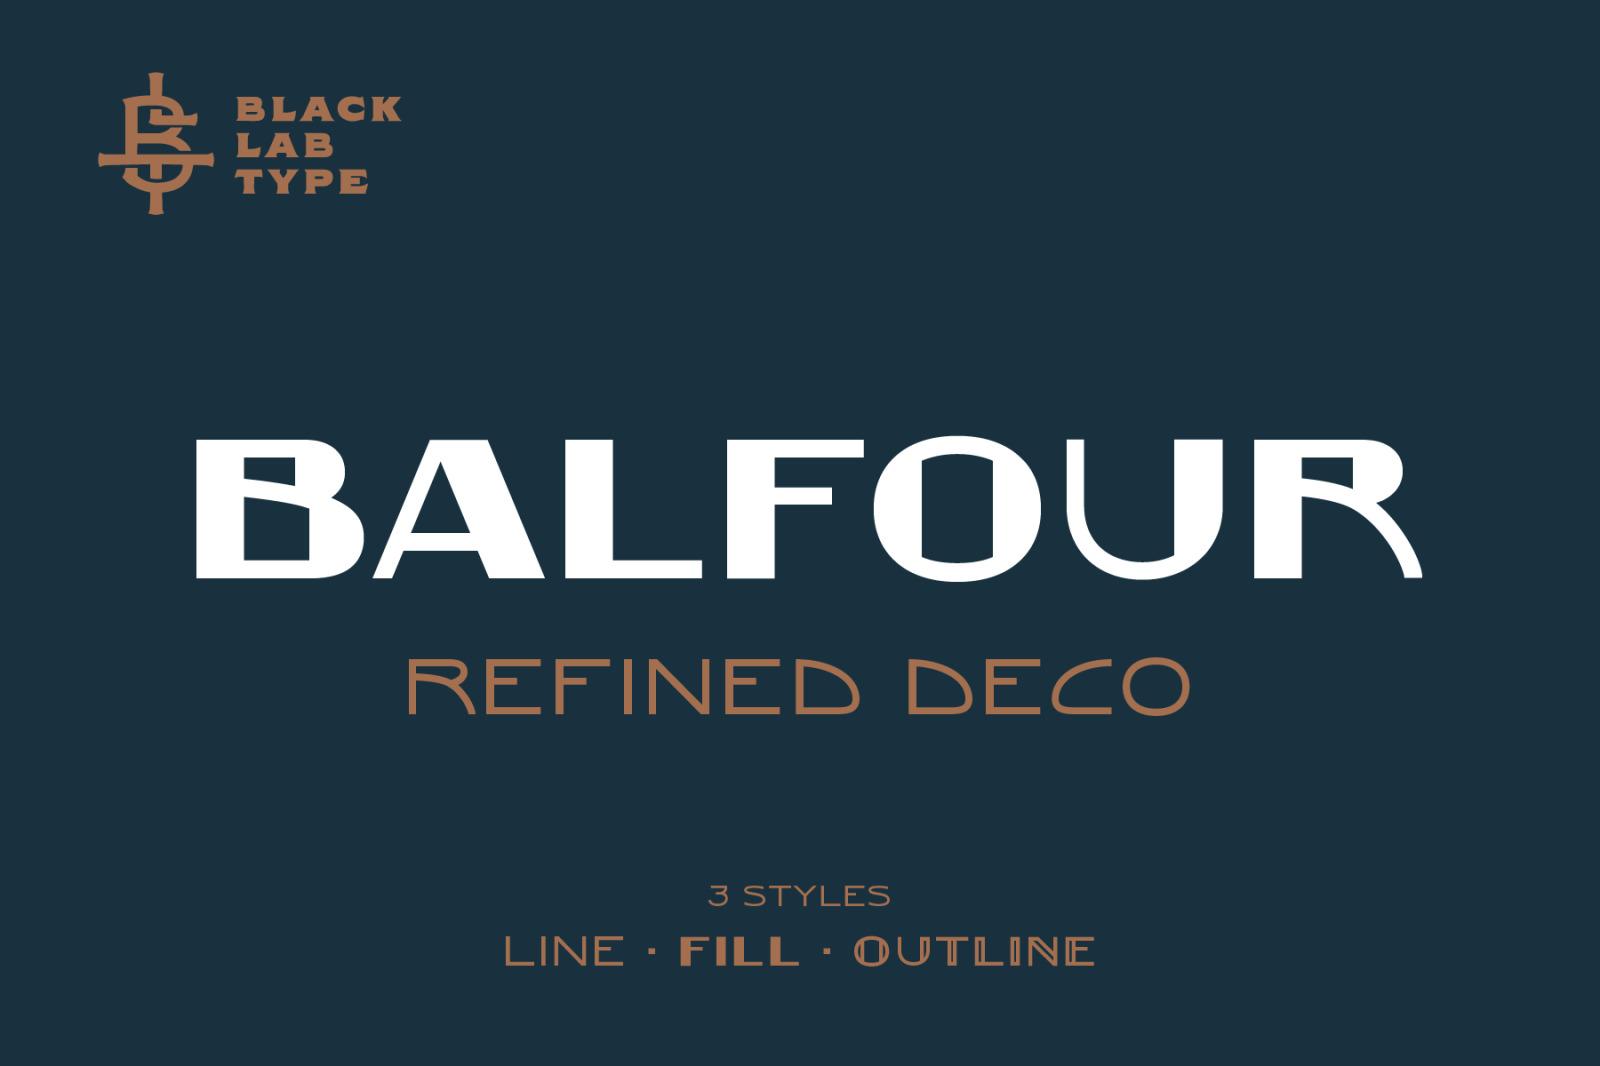 Balfour: Art Deco Revival Font